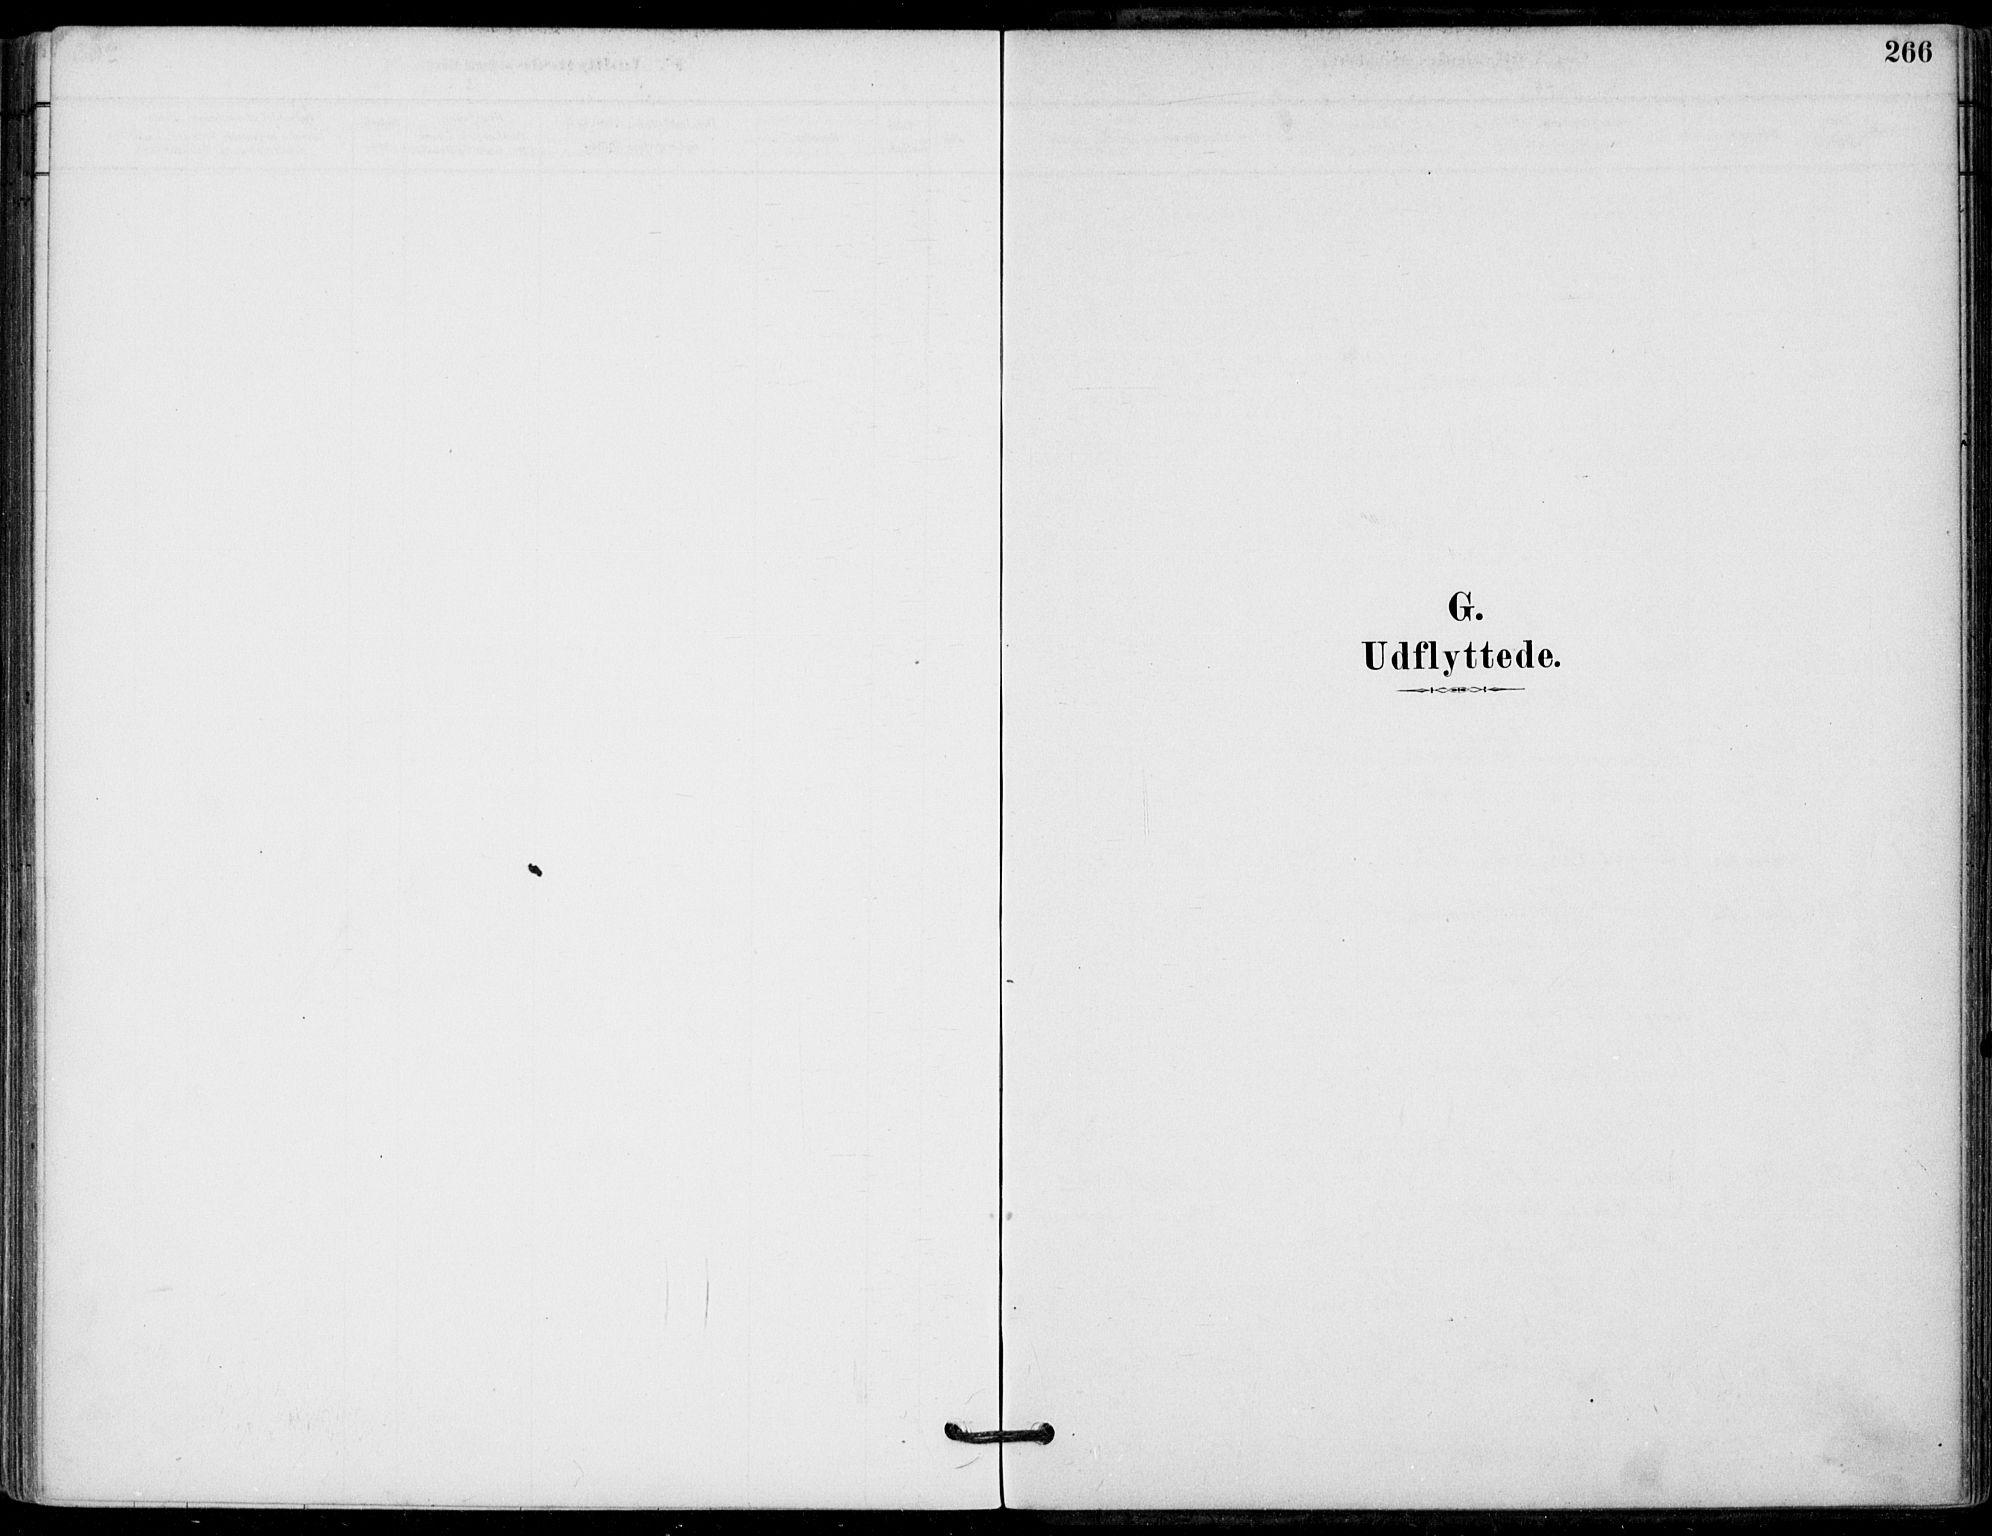 SAKO, Hjartdal kirkebøker, F/Fb/L0002: Ministerialbok nr. II 2, 1880-1932, s. 266